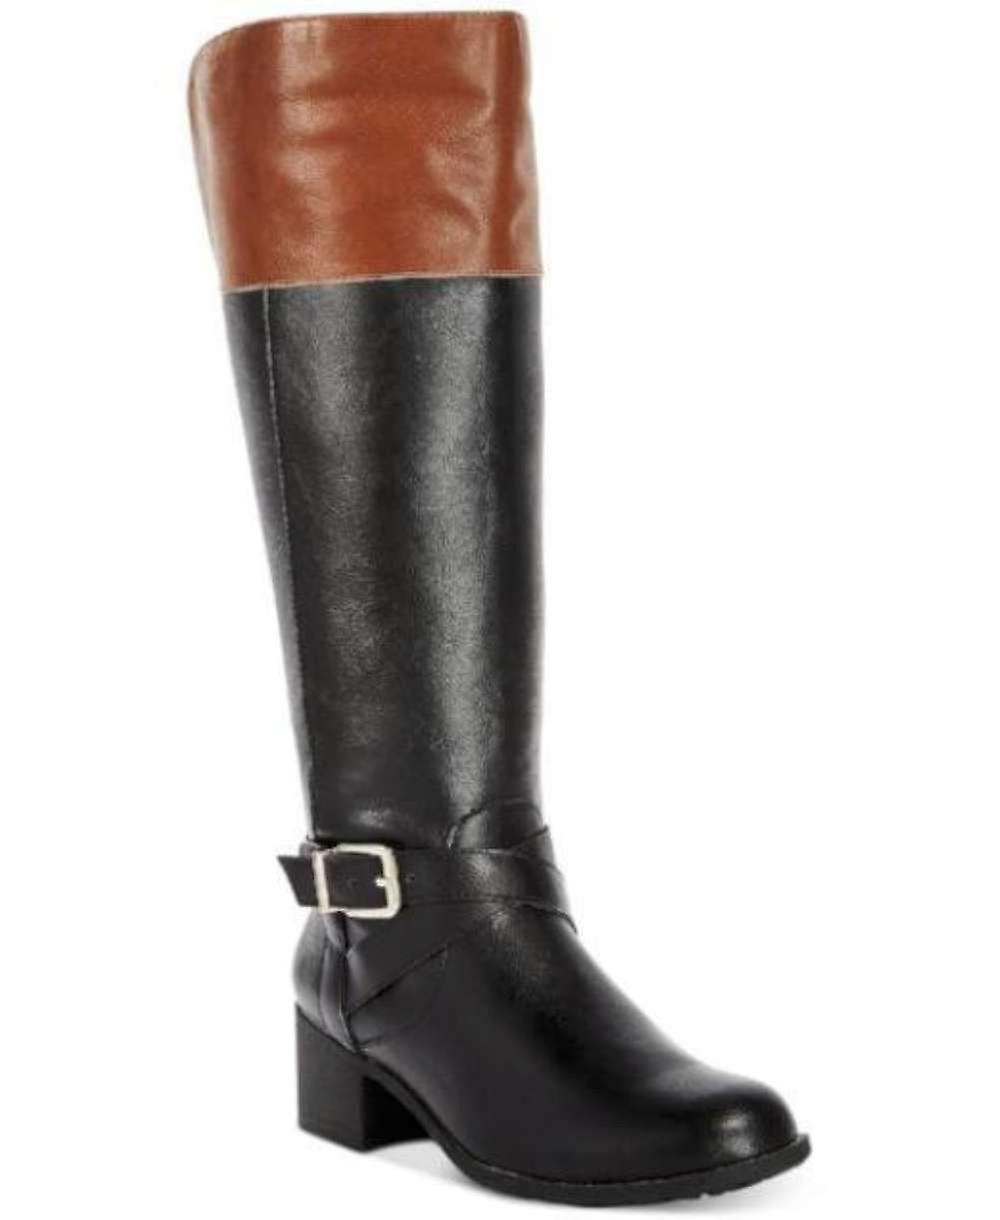 Style & Co. Womens Gensou Fermé Toe Knee High Fashion Bottes